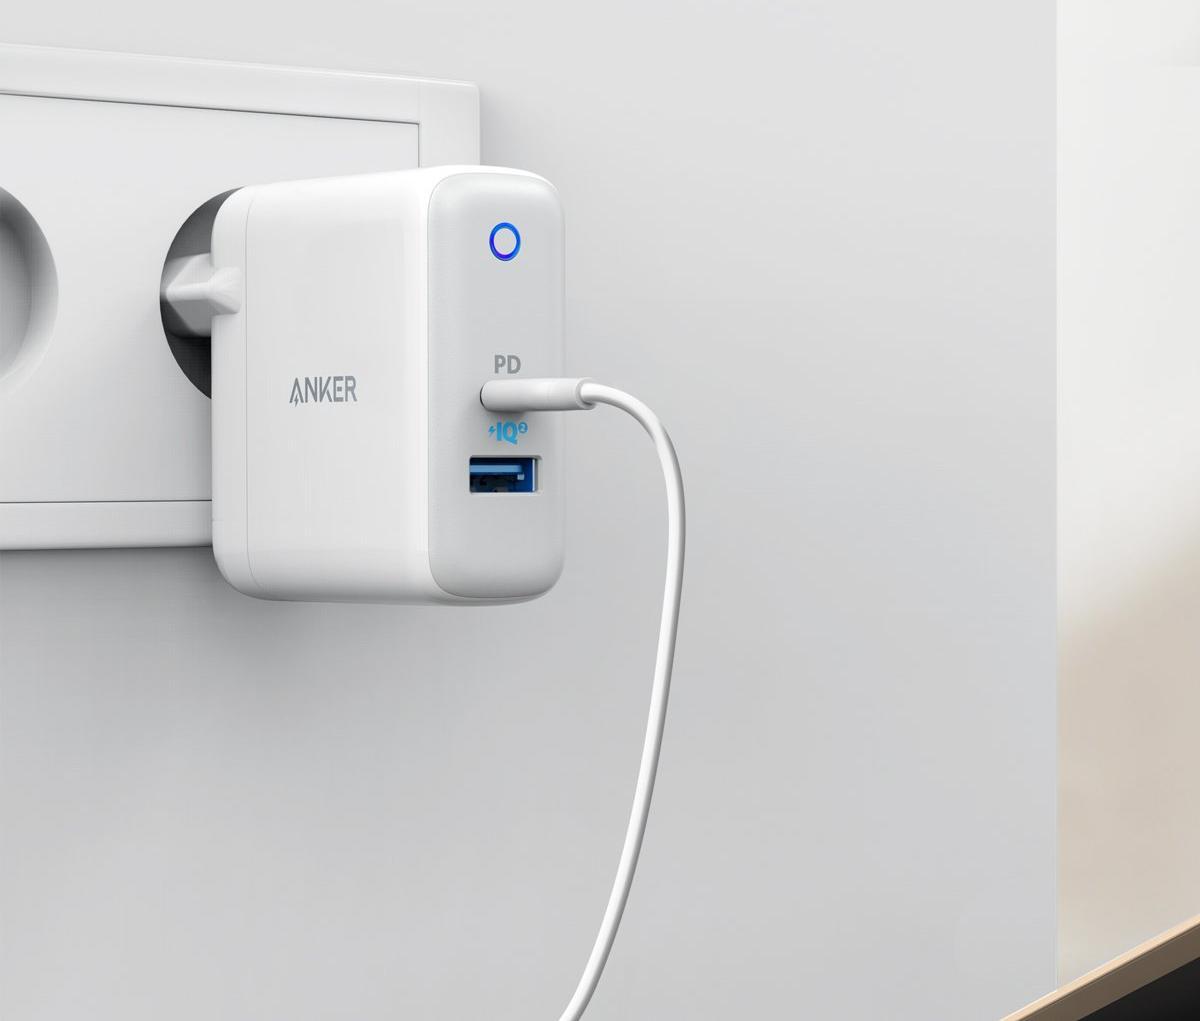 Сетевое зарядное устройство Anker Powerport 2 A2321321 (White)